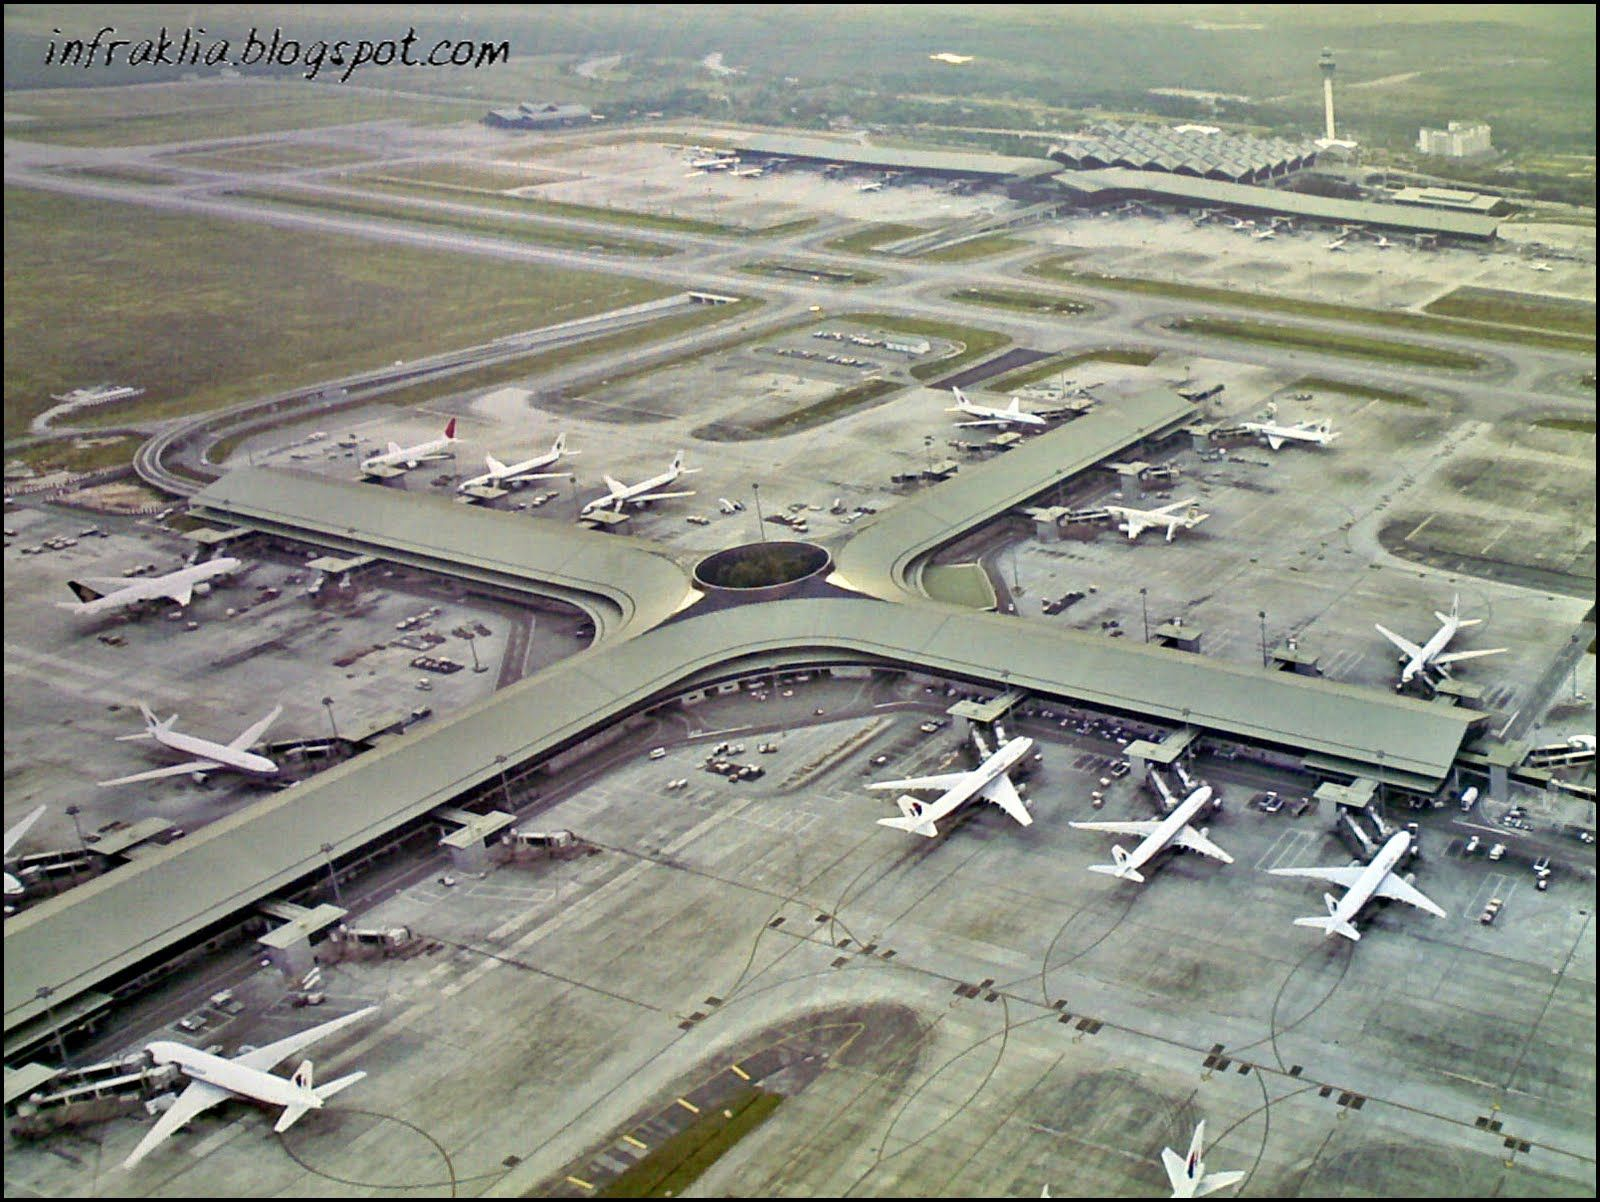 Kuala Lumpur International Airport Airport Design Kuala Lumpur International Airport Airport Photos